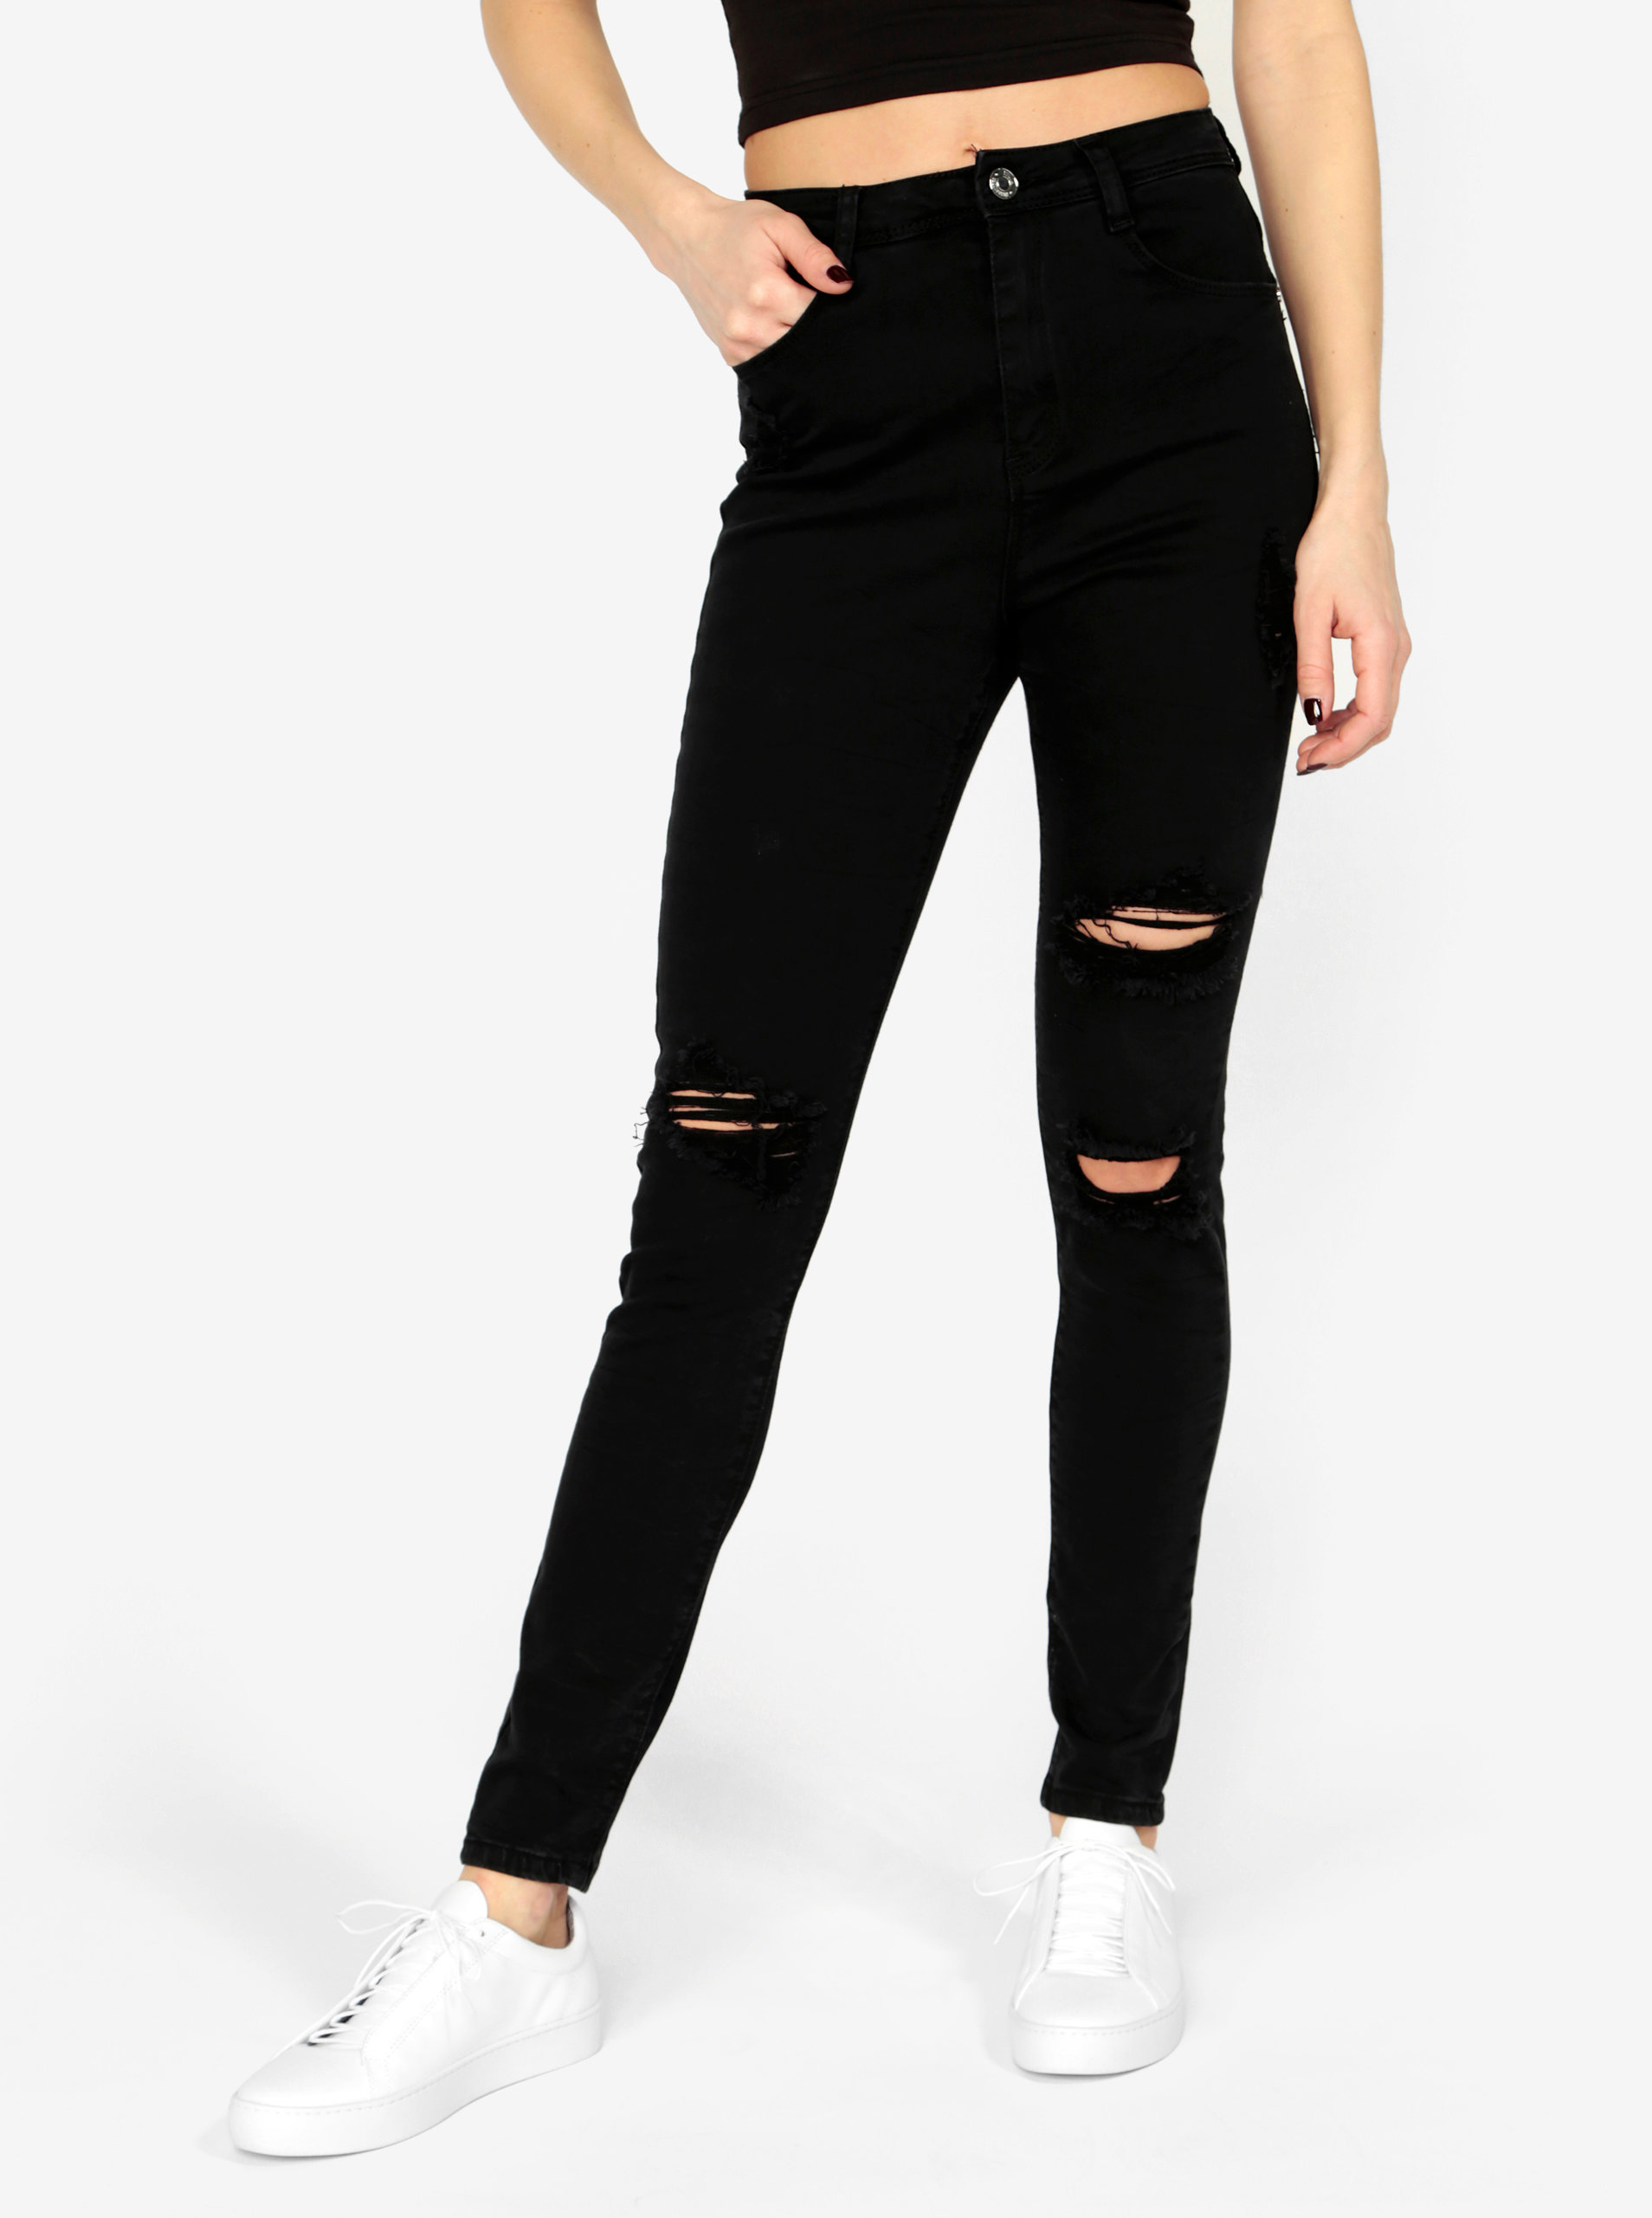 7971b1fca90 Černé skinny džíny s vysokým pasem MISSGUIDED ...